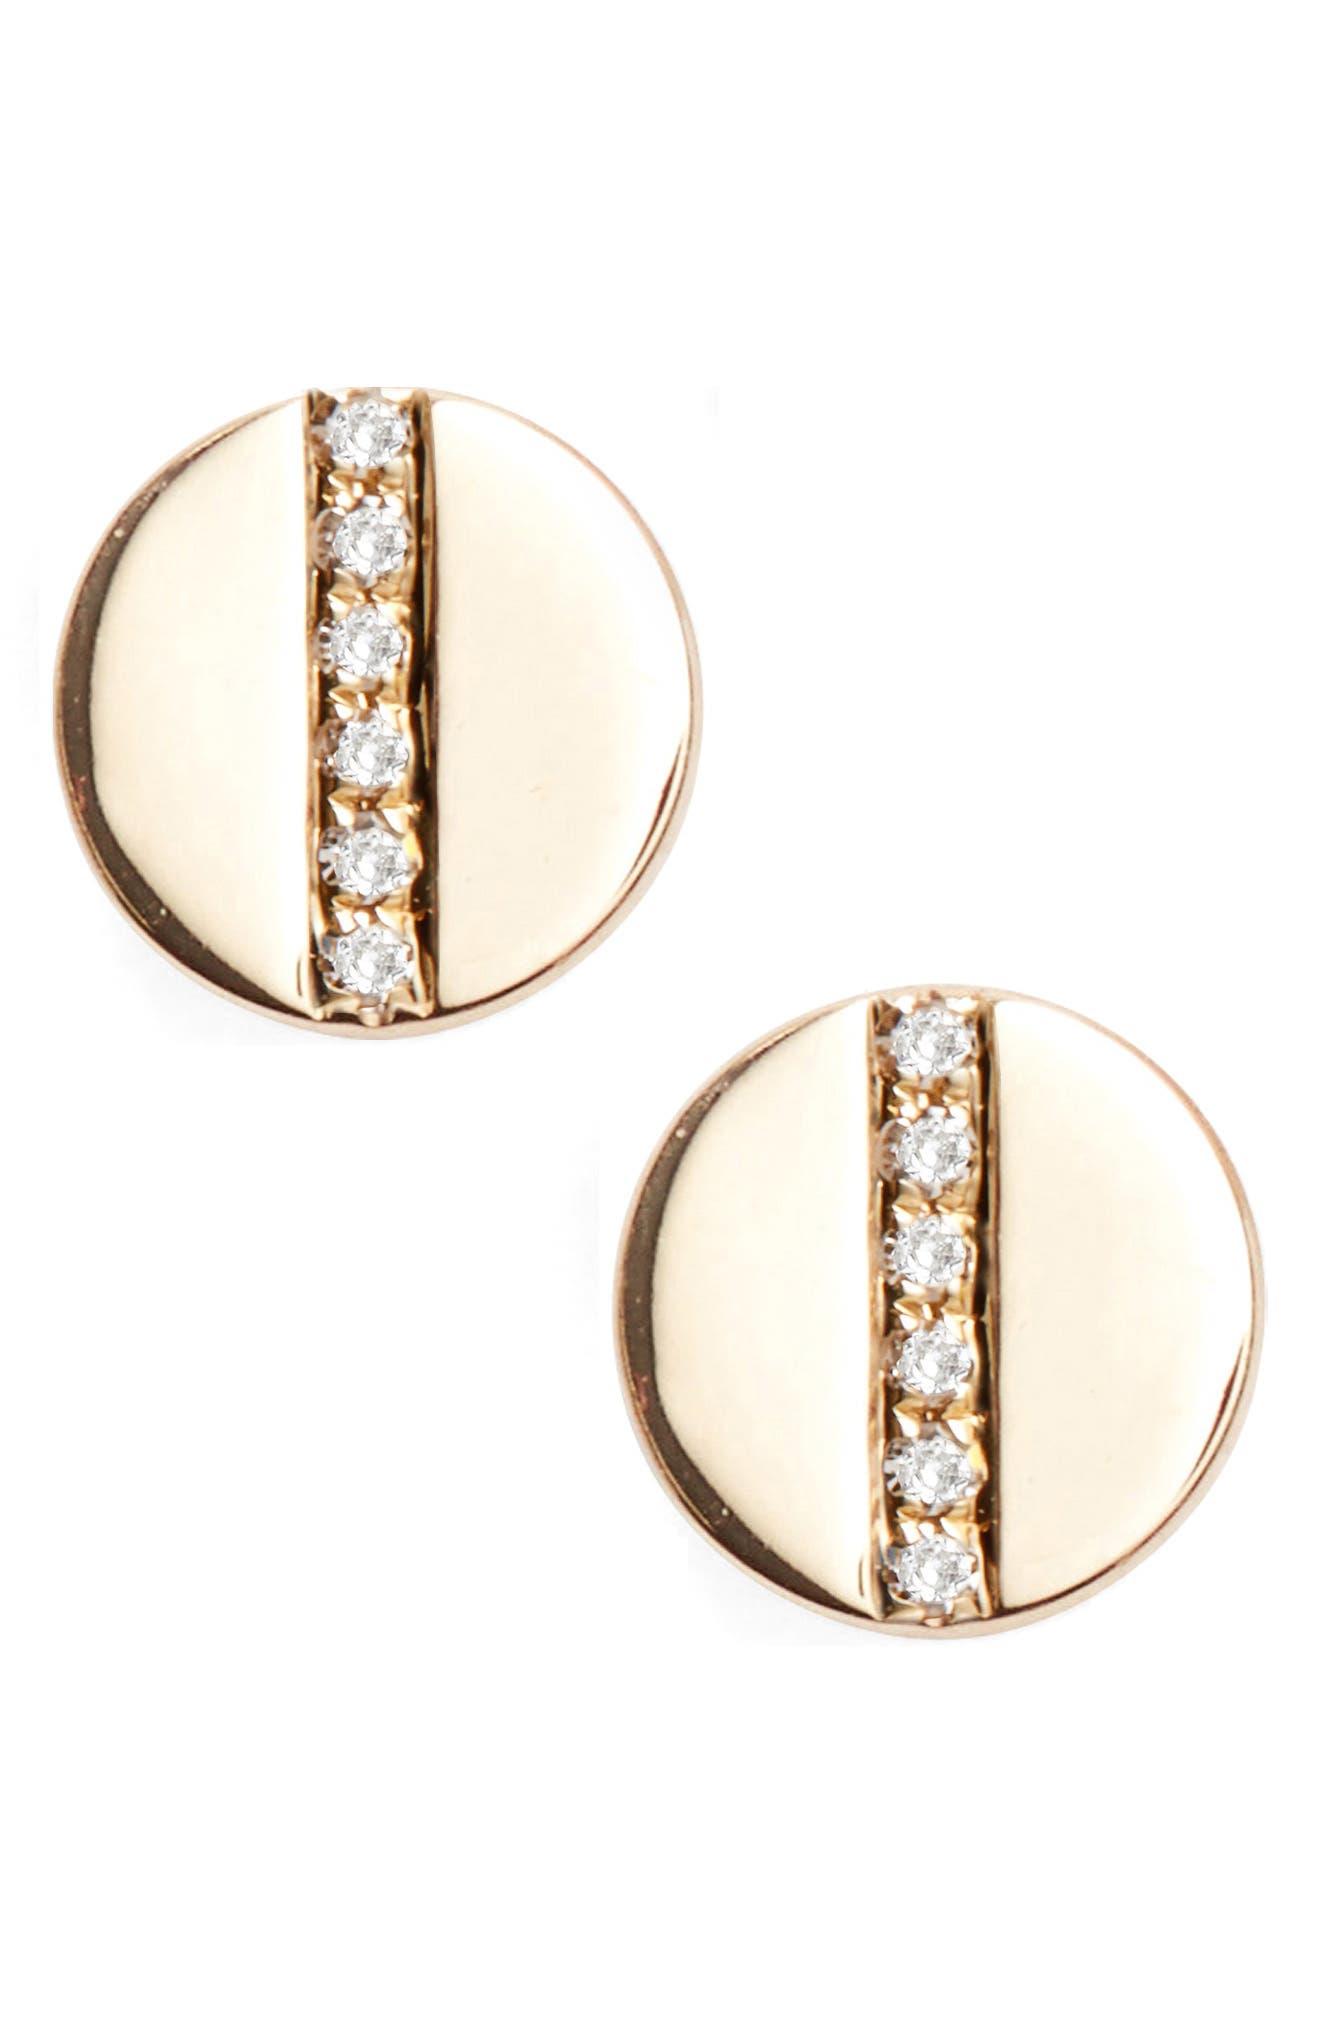 Screw Diamond Stud Earrings,                         Main,                         color, YELLOW GOLD